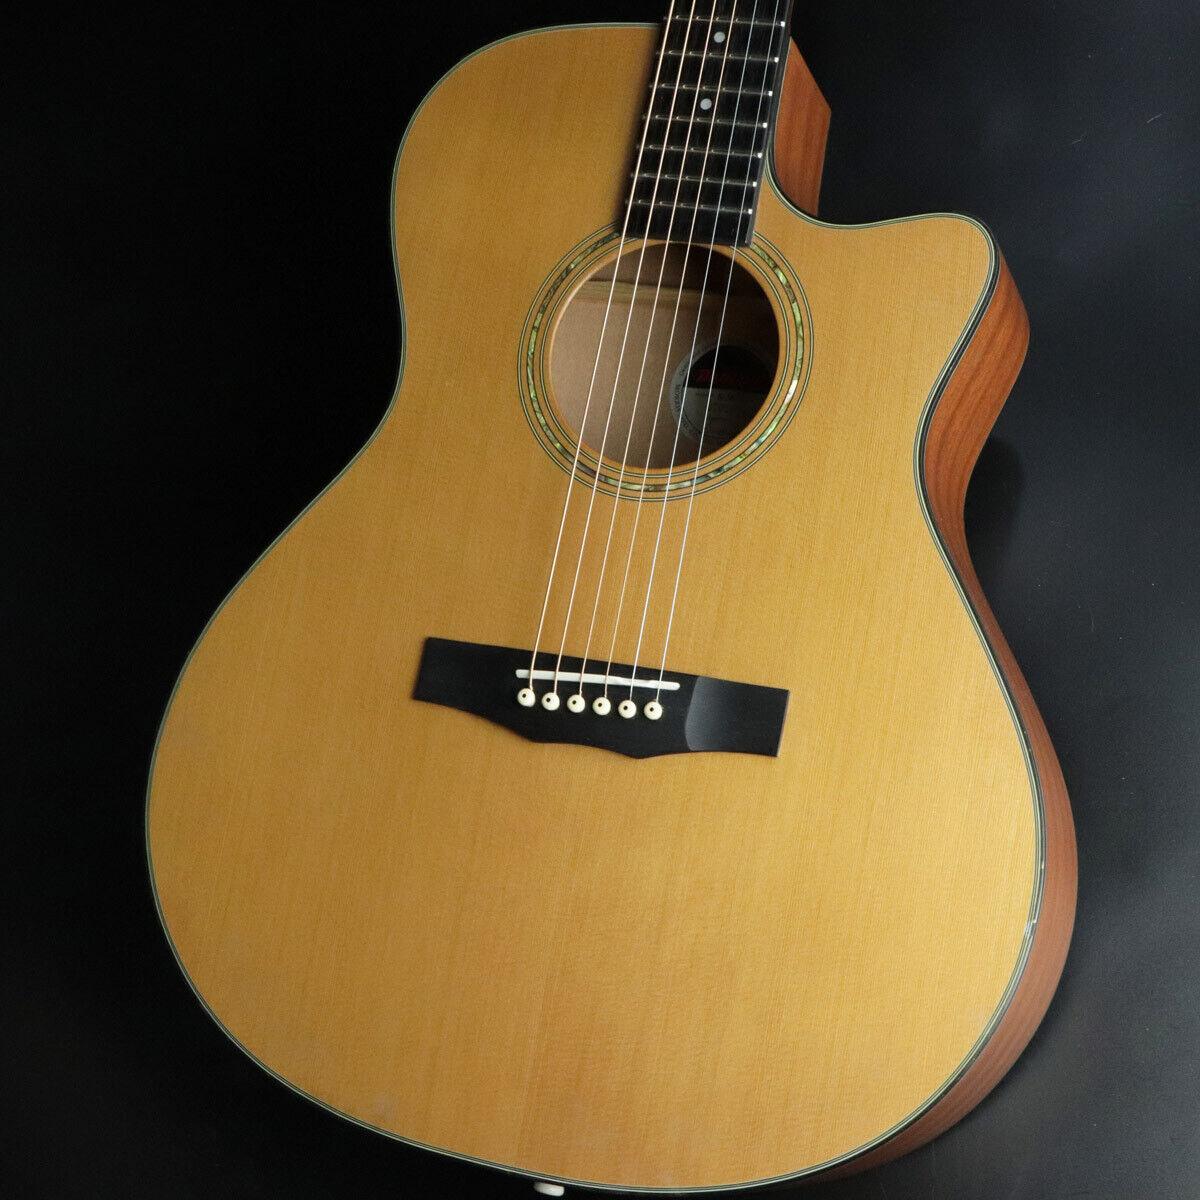 Morris S-30 Natural acoustic guitar Japan rare beautiful vintage popular EMS F S